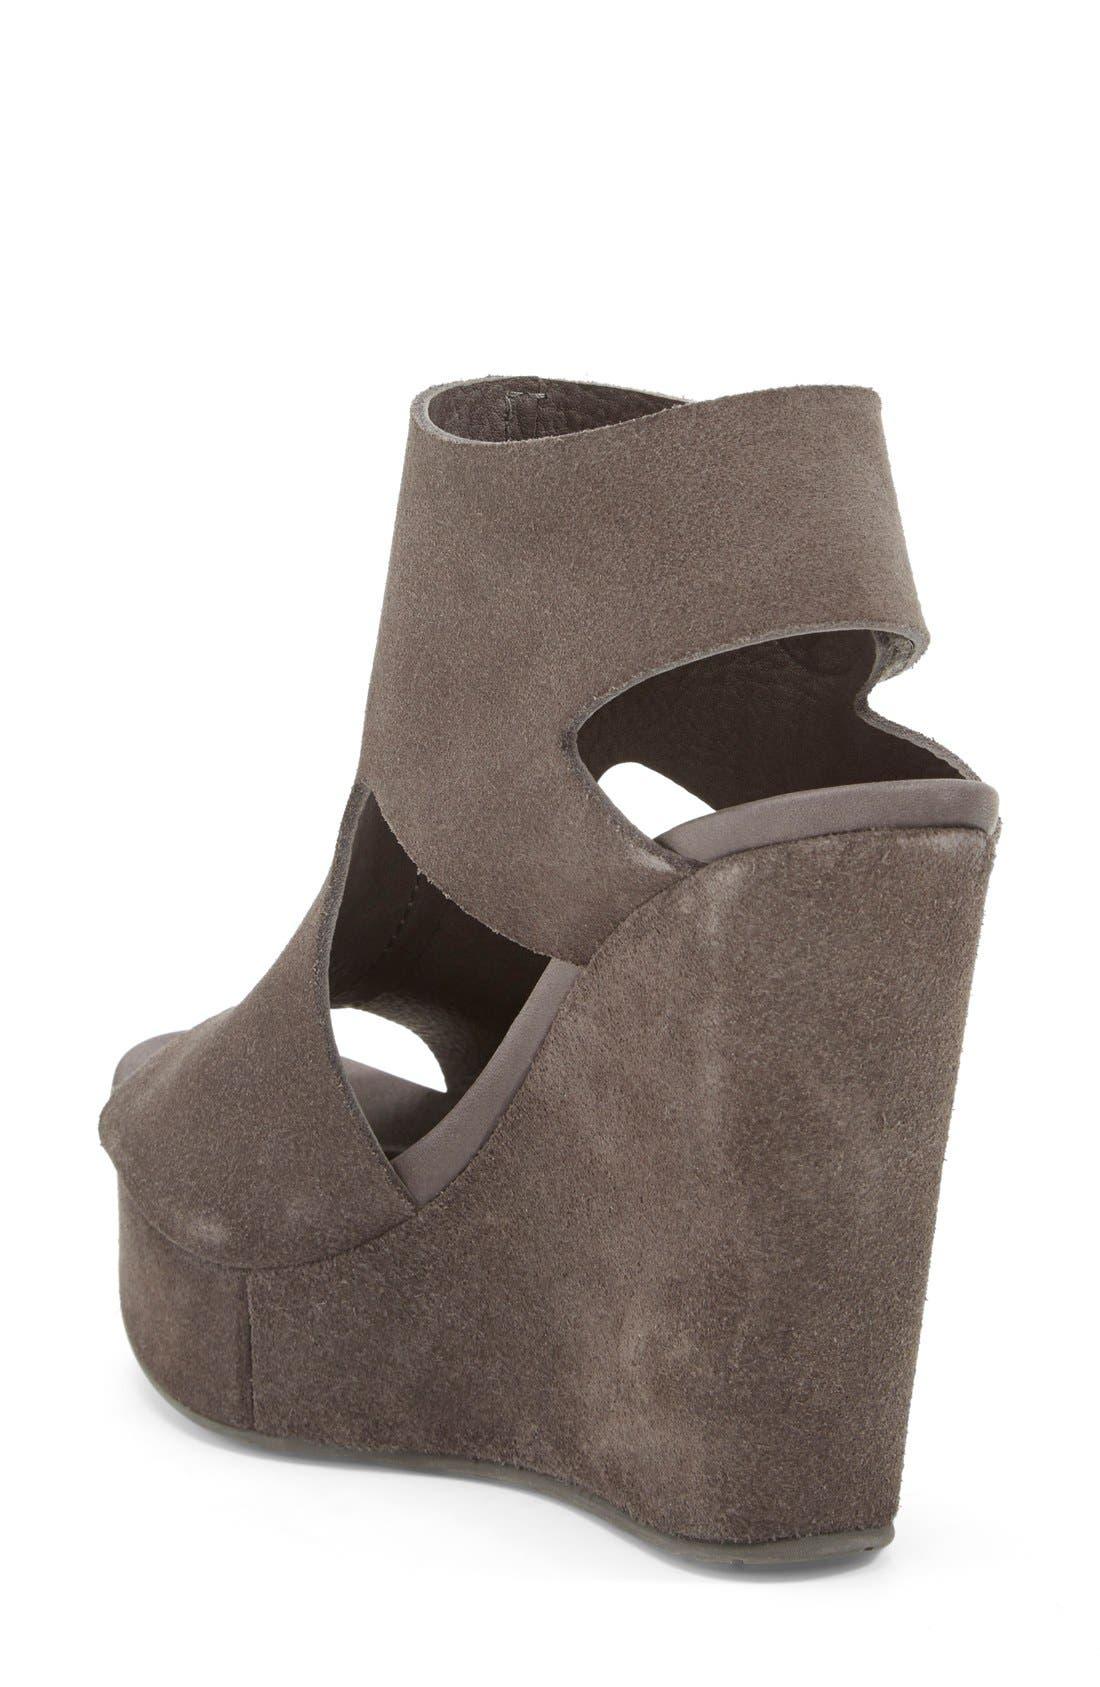 Alternate Image 2  - Pedro Garcia 'Terence' Platform Wedge Sandal (Women) (Nordstrom Exclusive)